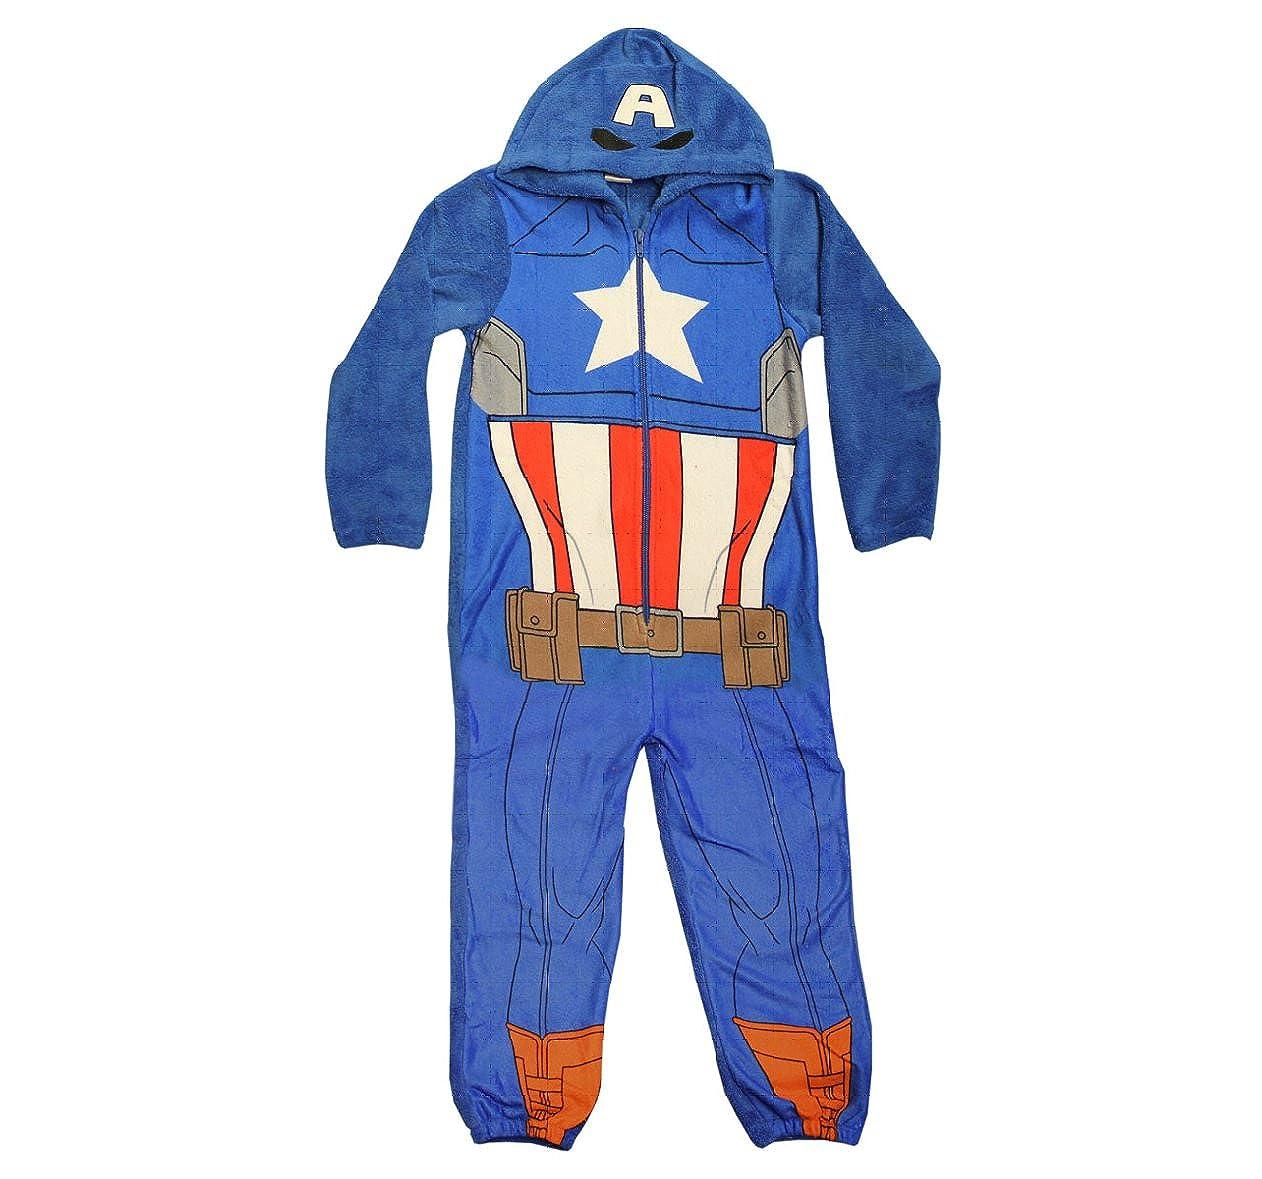 d8c11e7e9c952b Captain america Dress-up Hooded Onesie 11-12 Years  Amazon.co.uk  Clothing